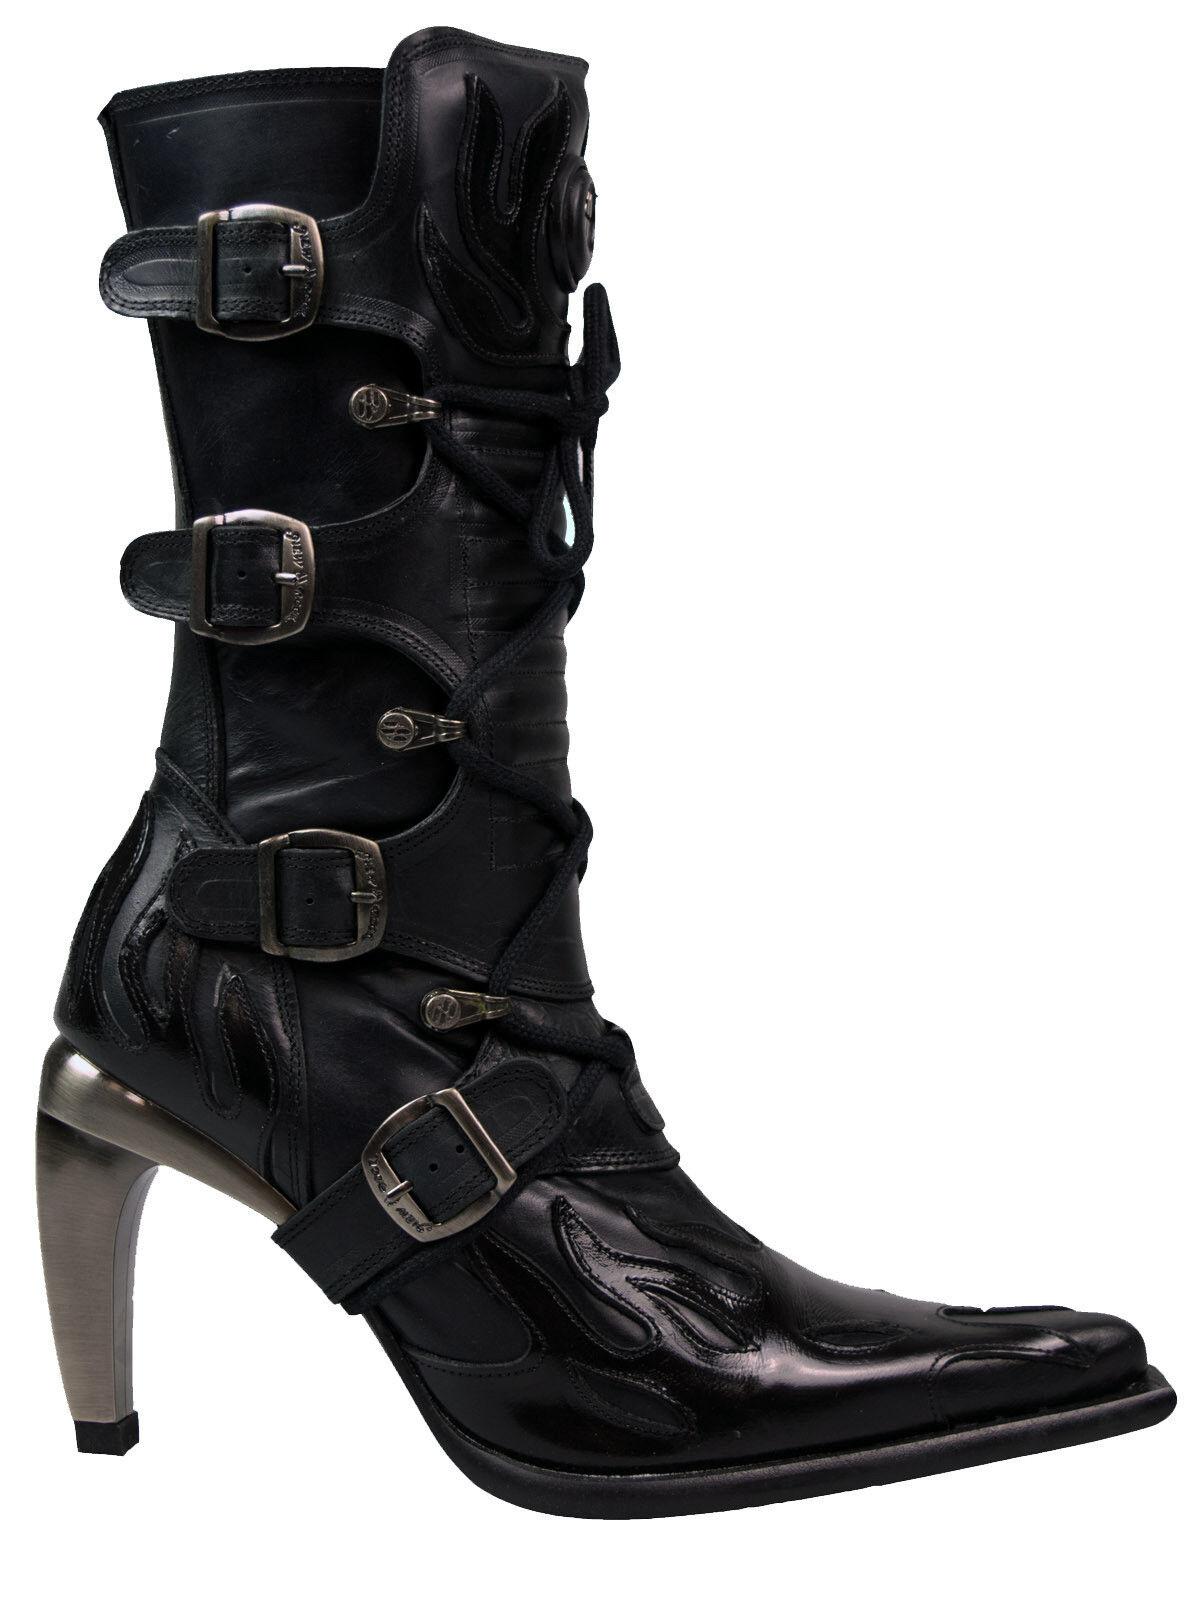 New Rock High Heel   Damen Stiefel Stiefel Flamme Lack MeGrößebsatz M951  5072